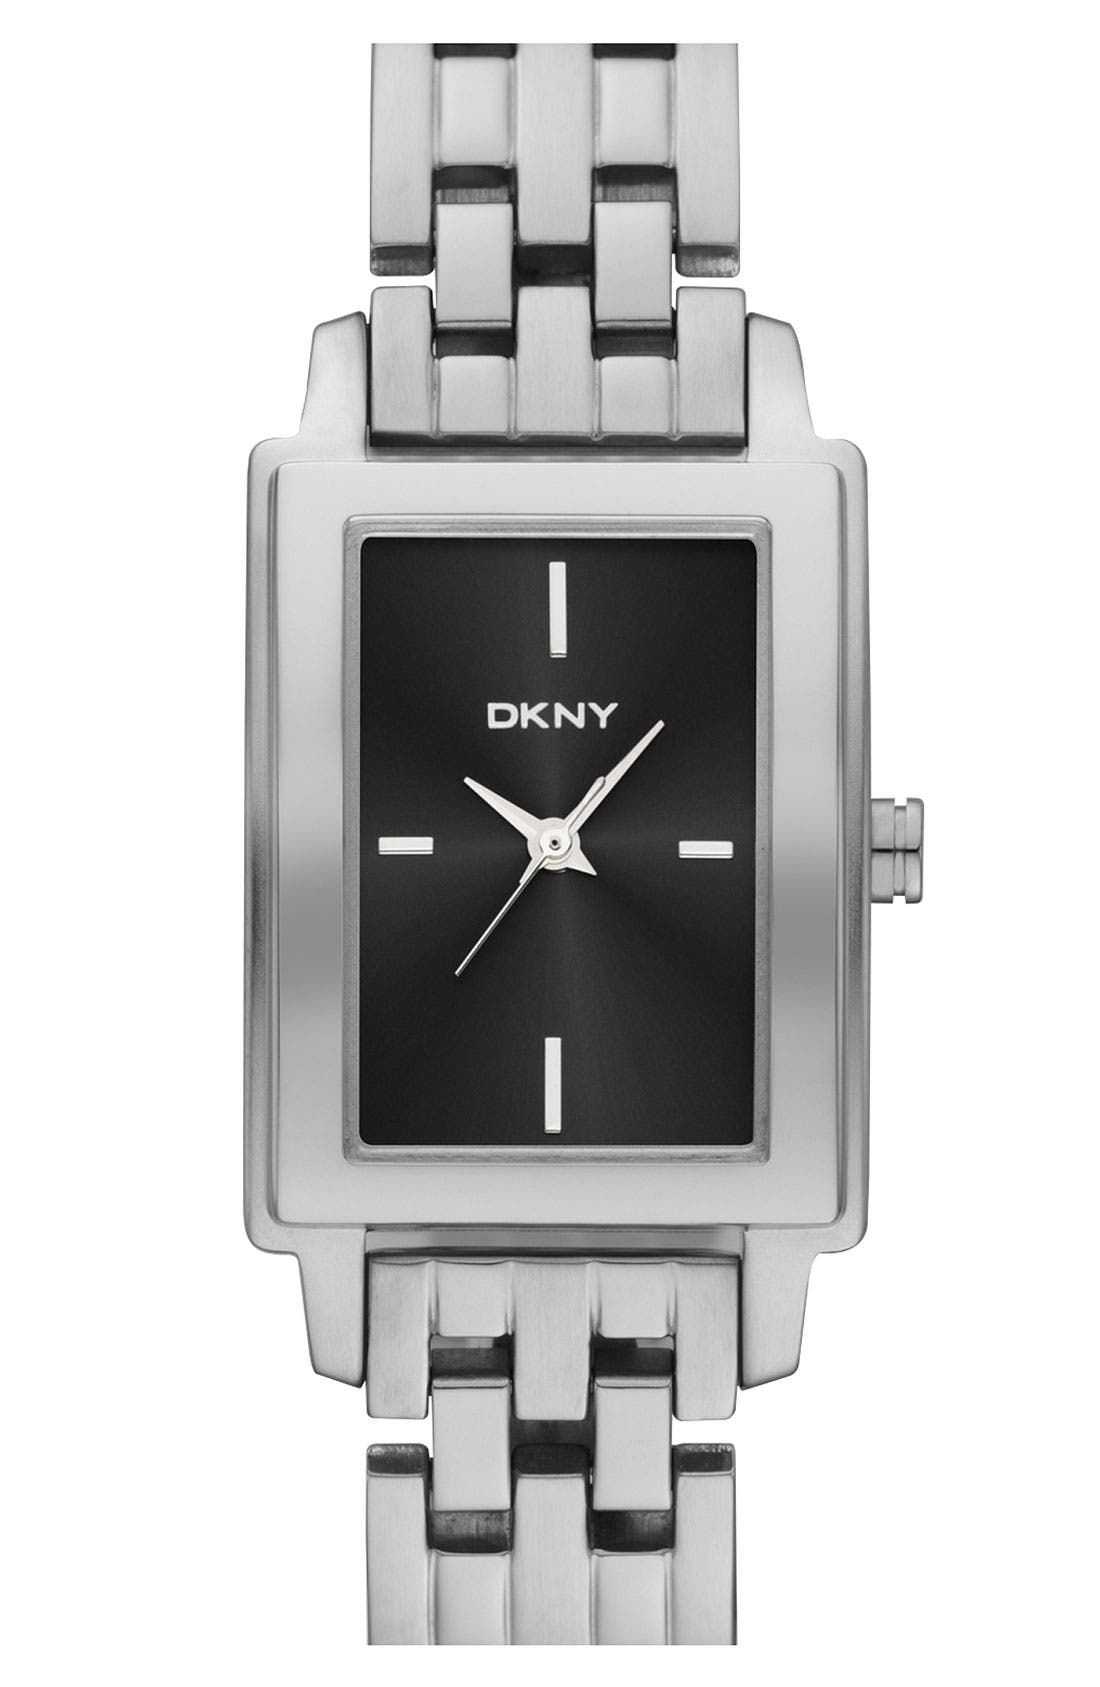 Main Image - DKNY Rectangular Bracelet Watch, 23mm x 28mm